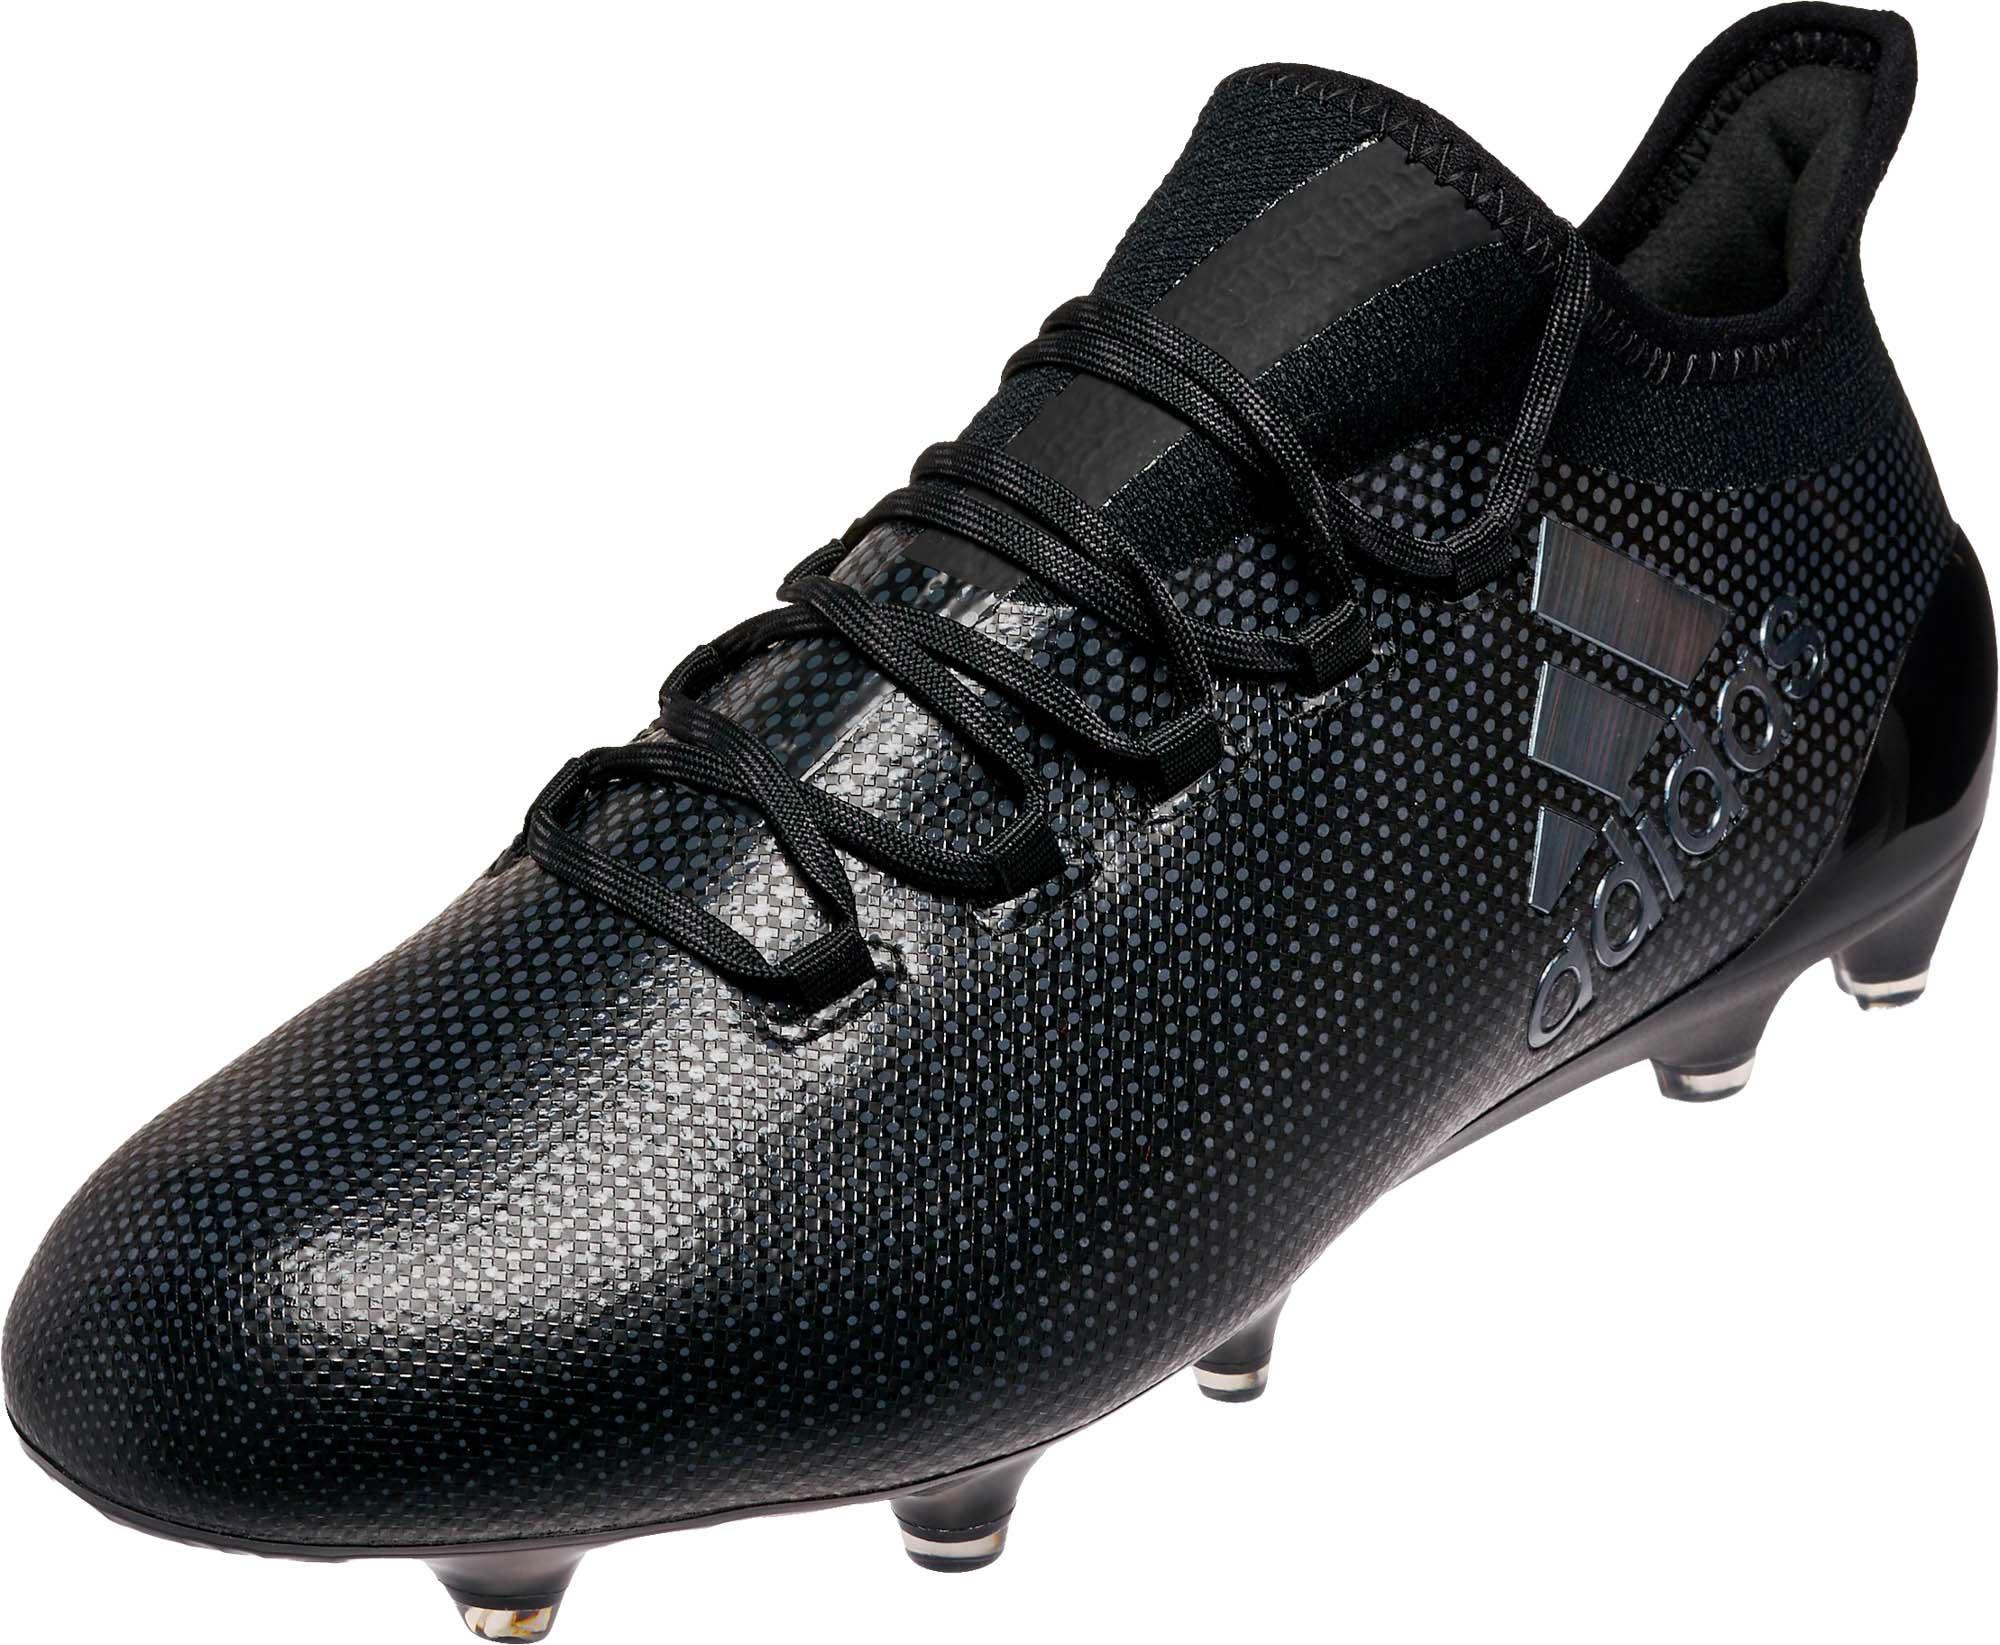 adidas X 17.1 FG Soccer Cleats - Black - Soccer Master 2933cae36fb5